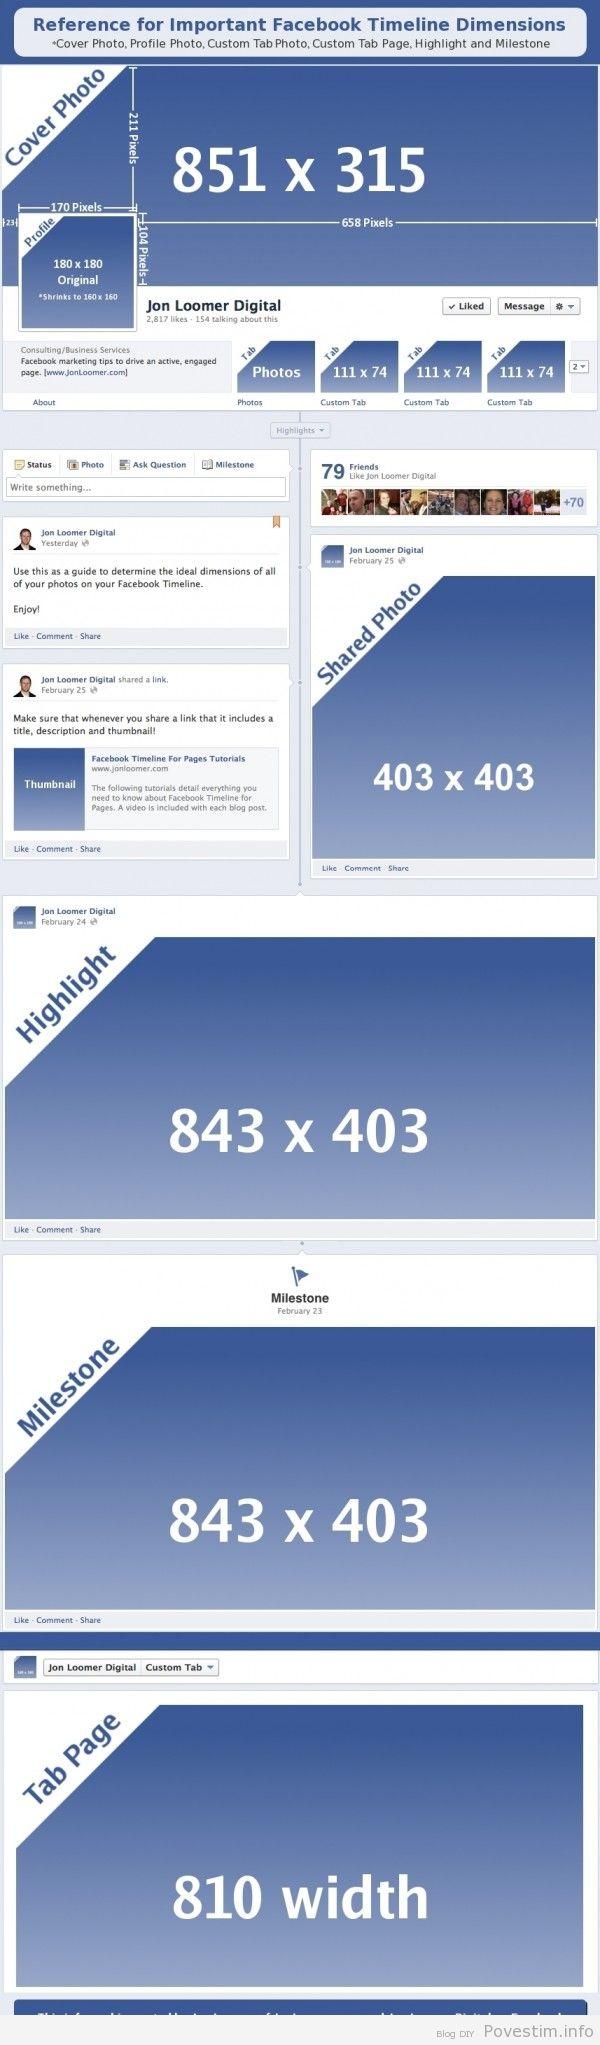 dimenisiuni timeline facebook